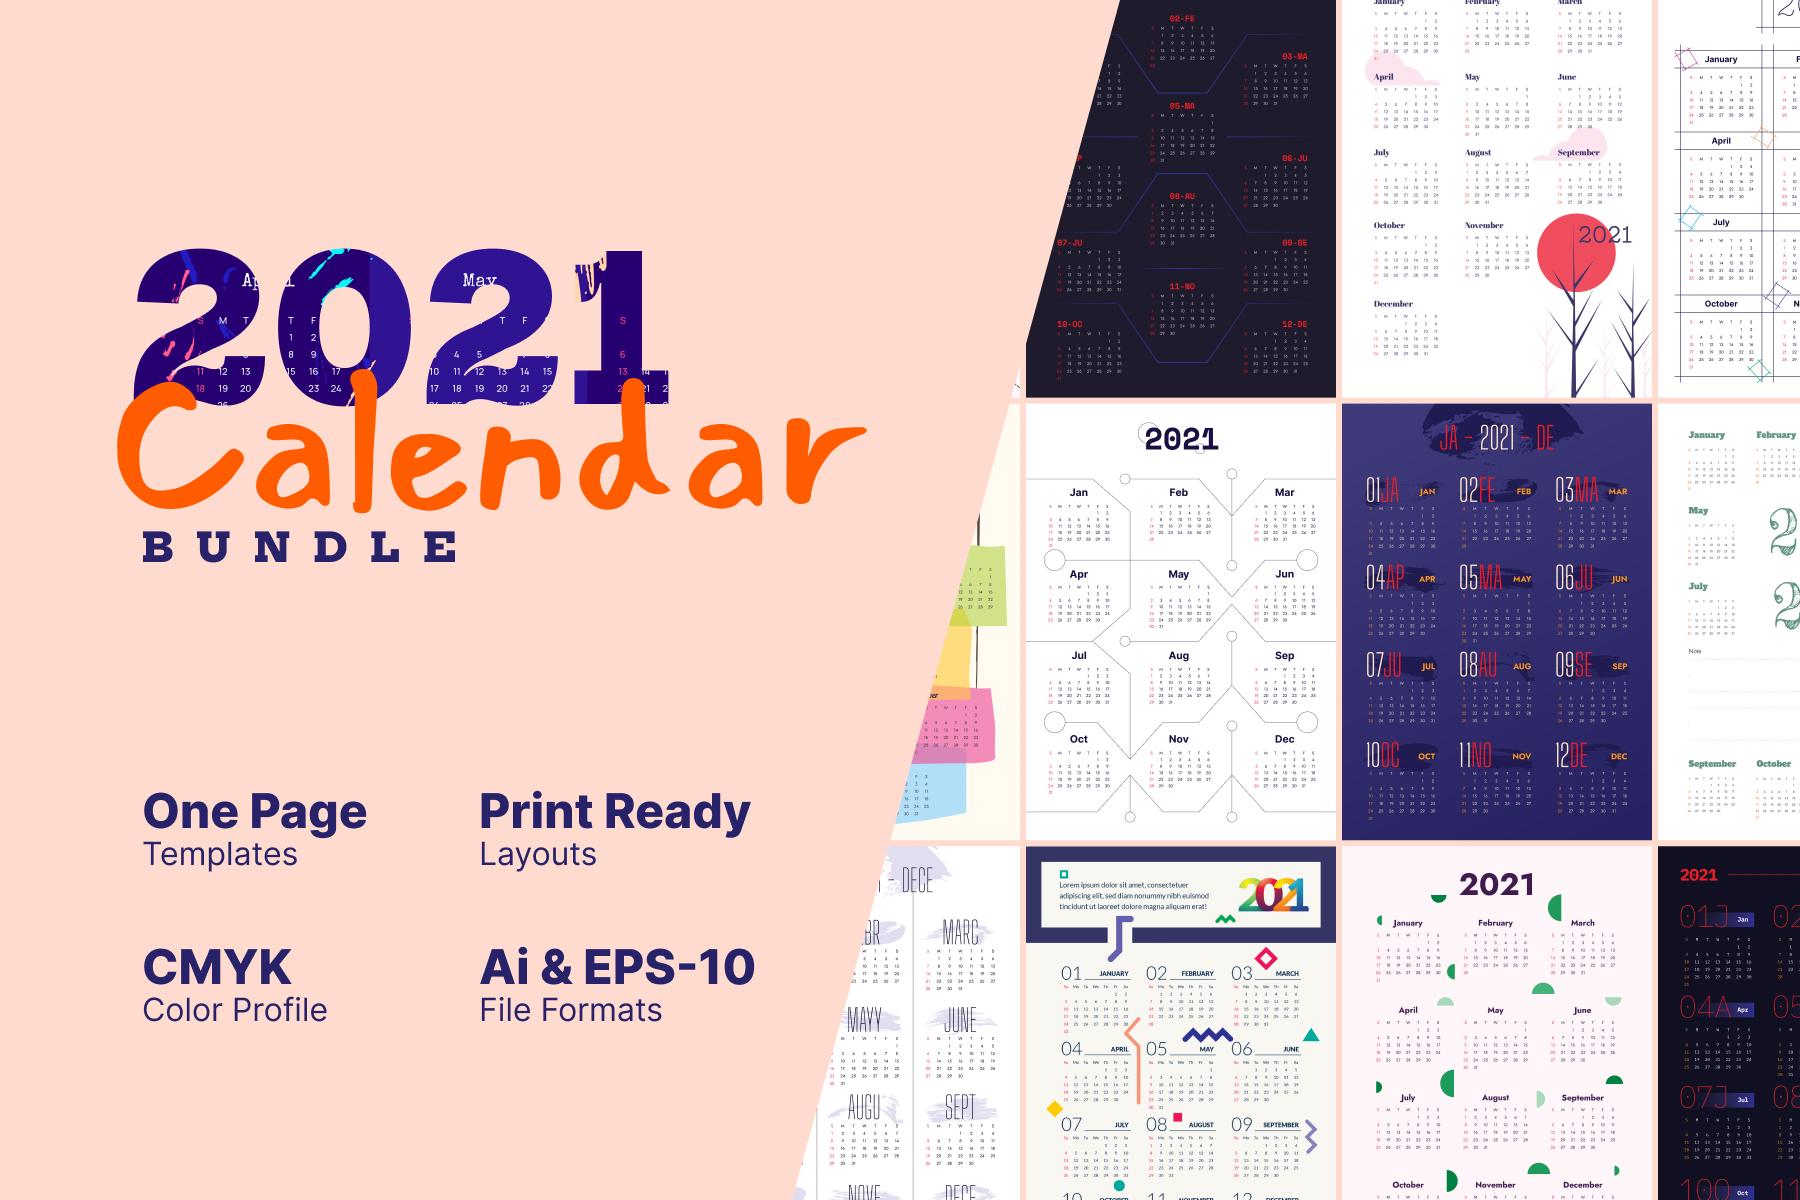 Calendar Features & Details